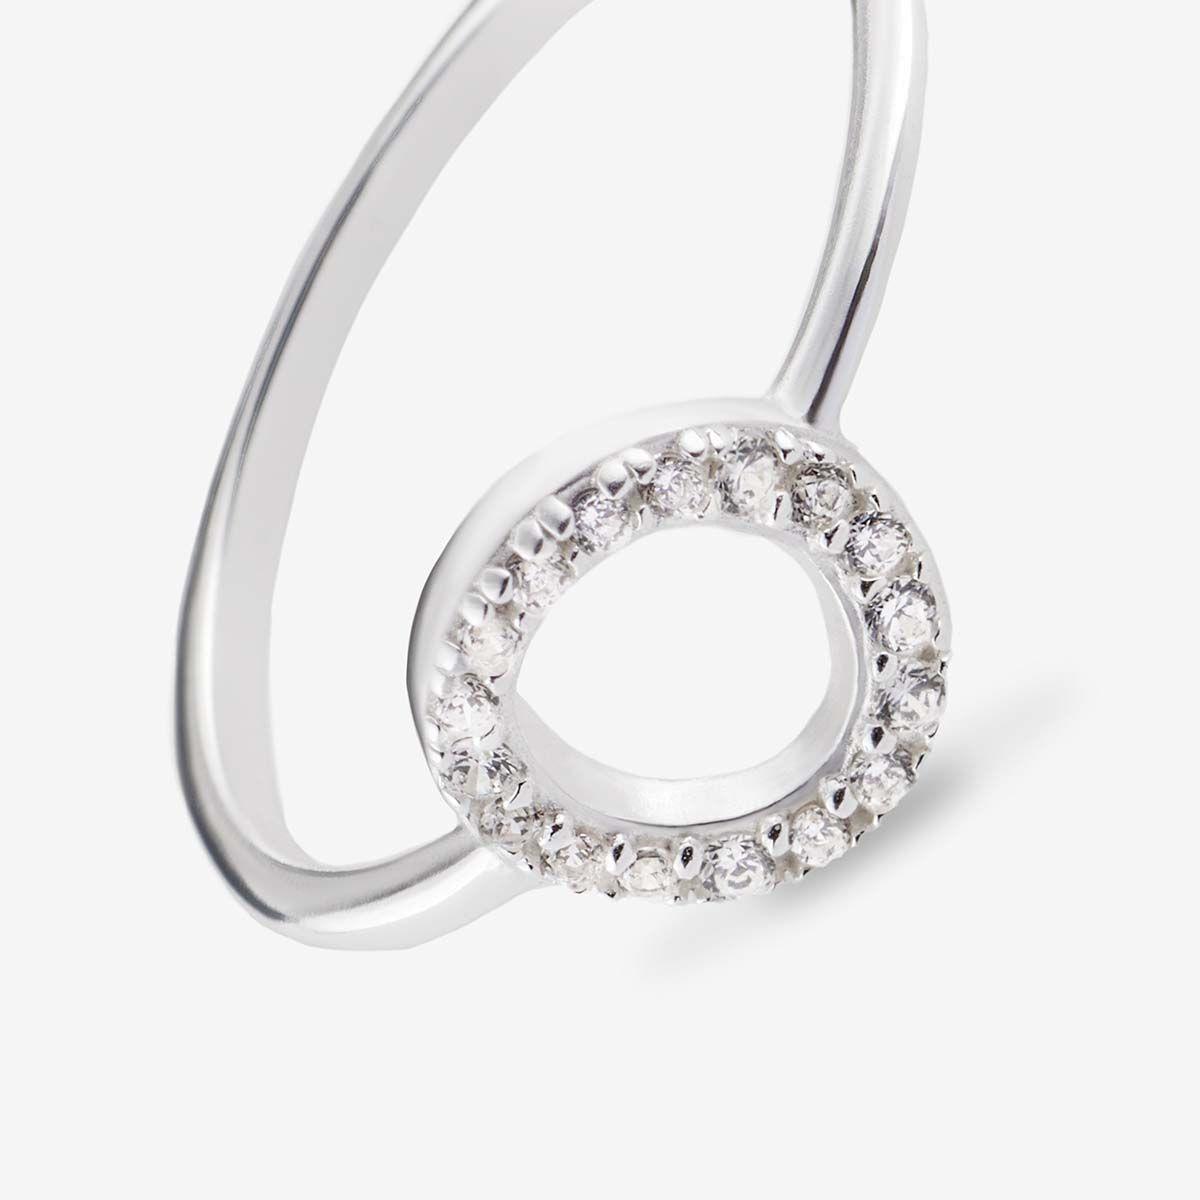 Suna - Ringe - Silber